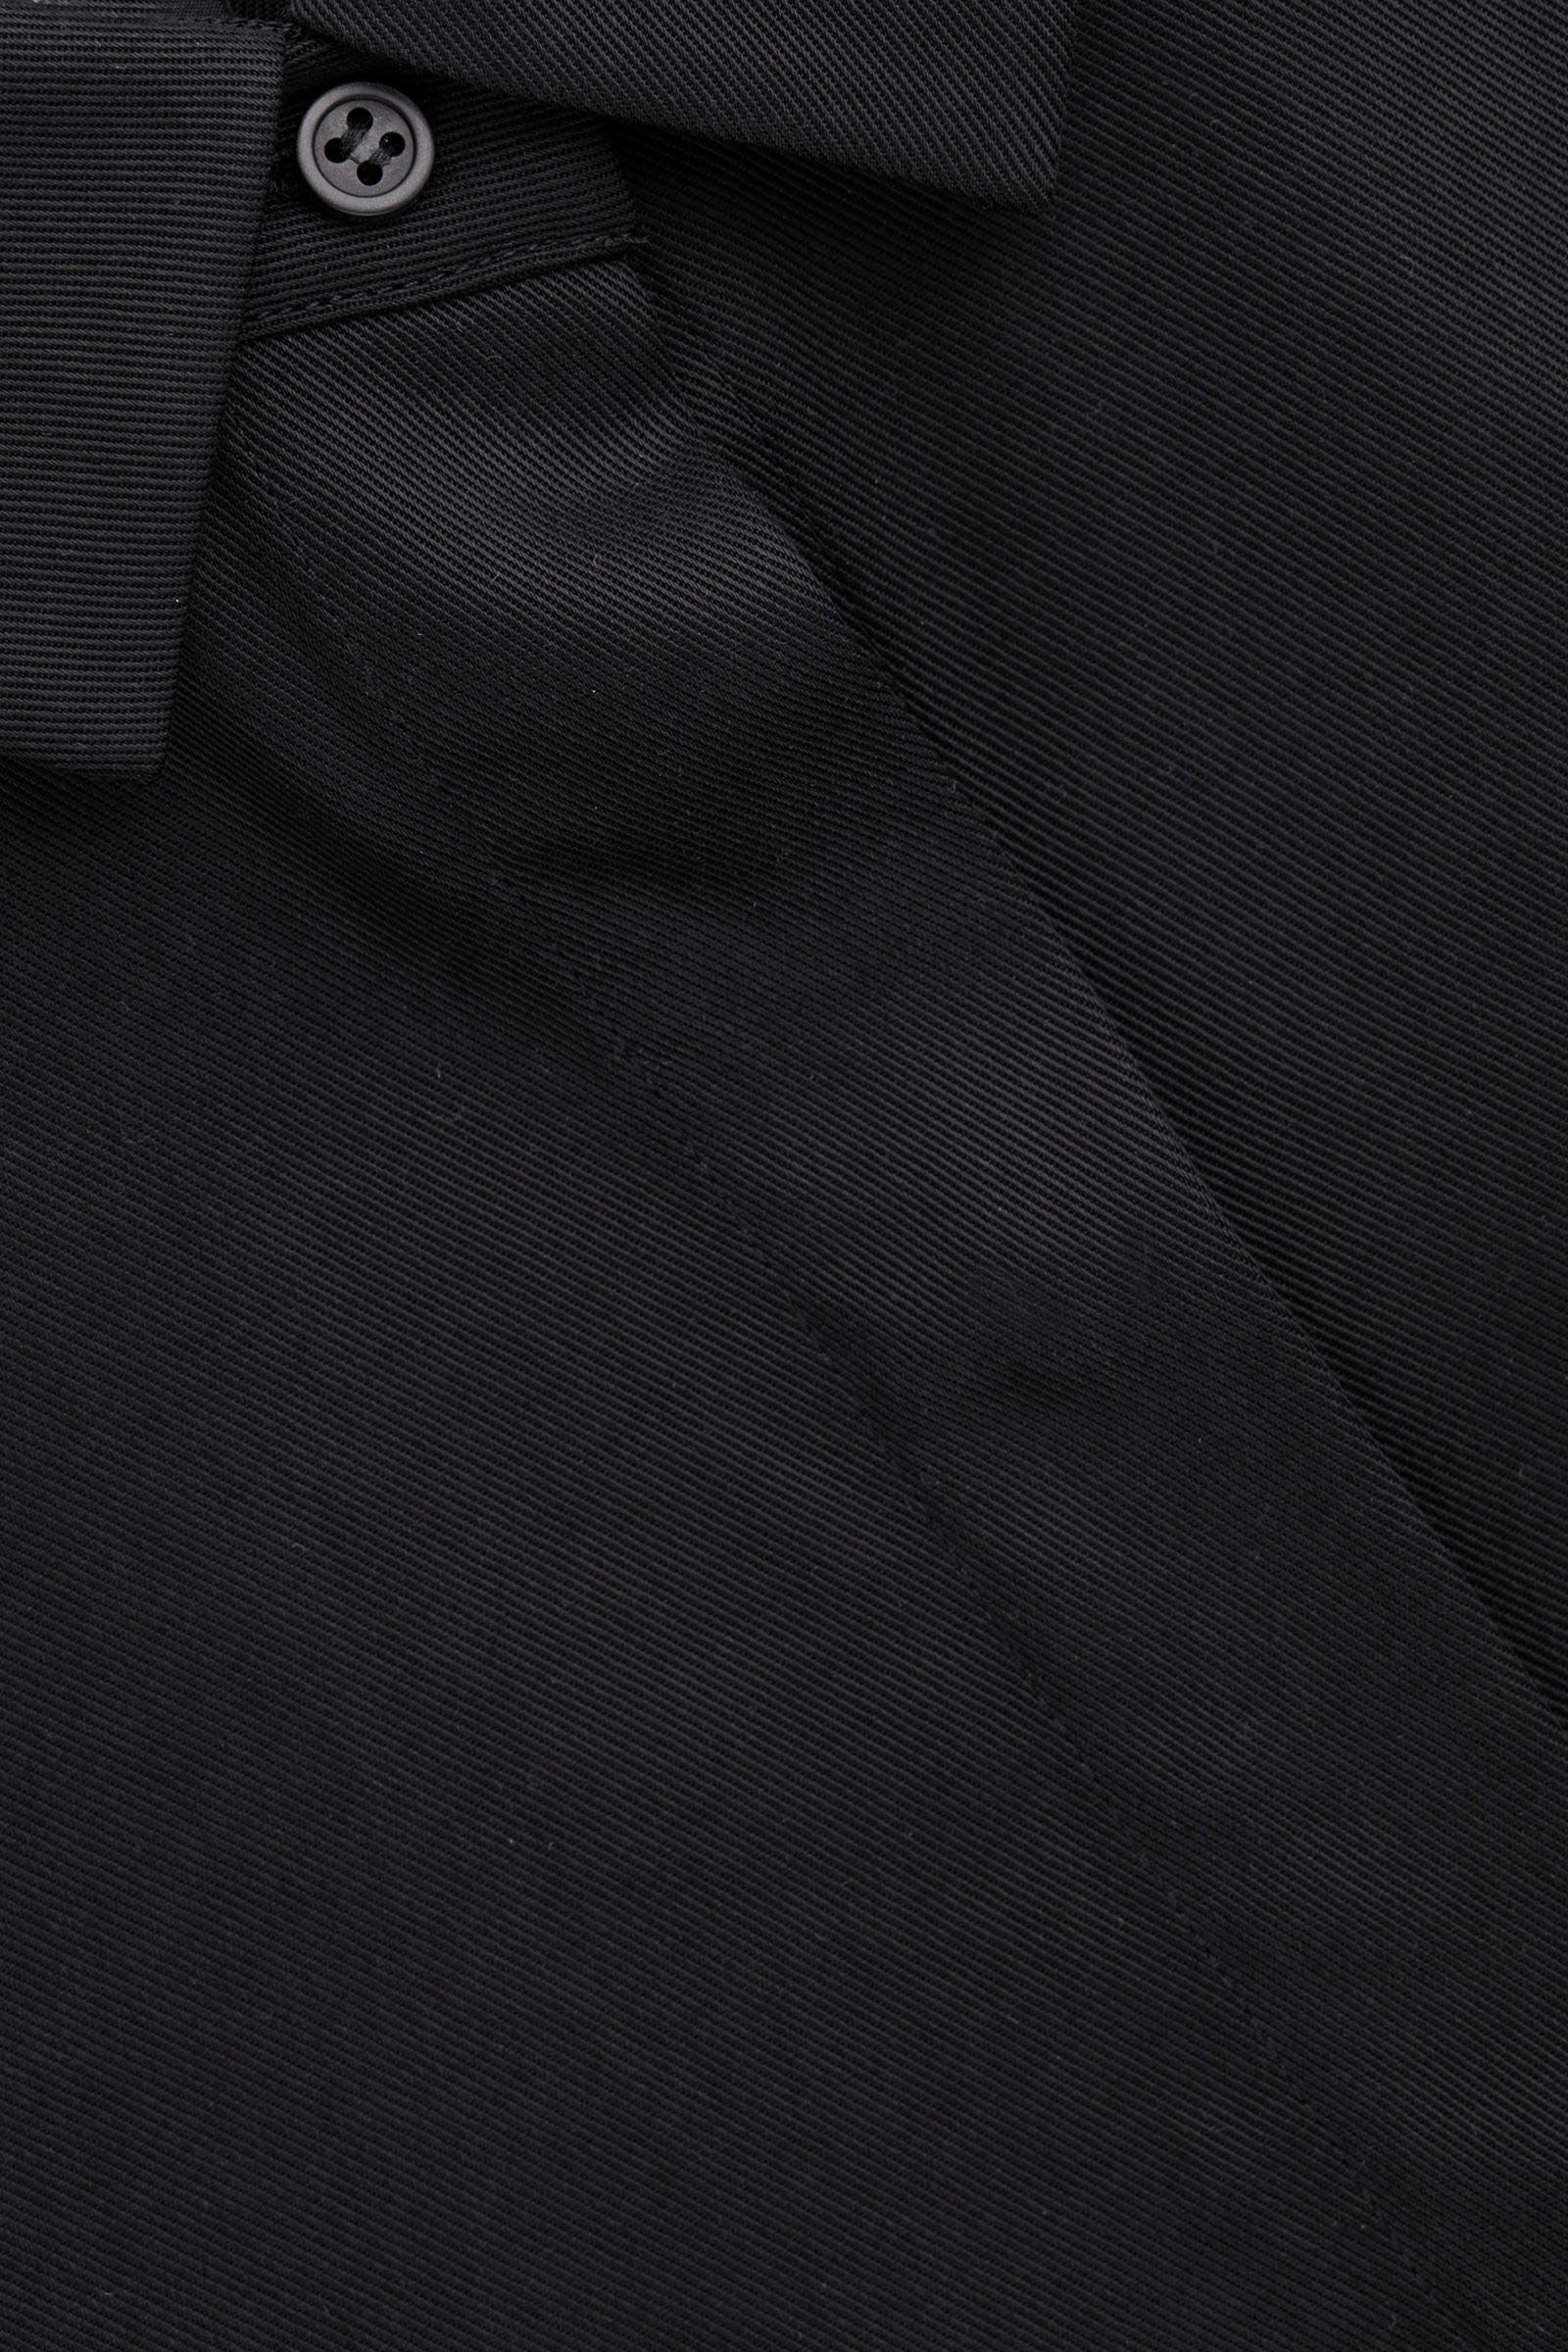 COS 드레이프드 박시 셔츠 드레스의 블랙컬러 Product입니다.